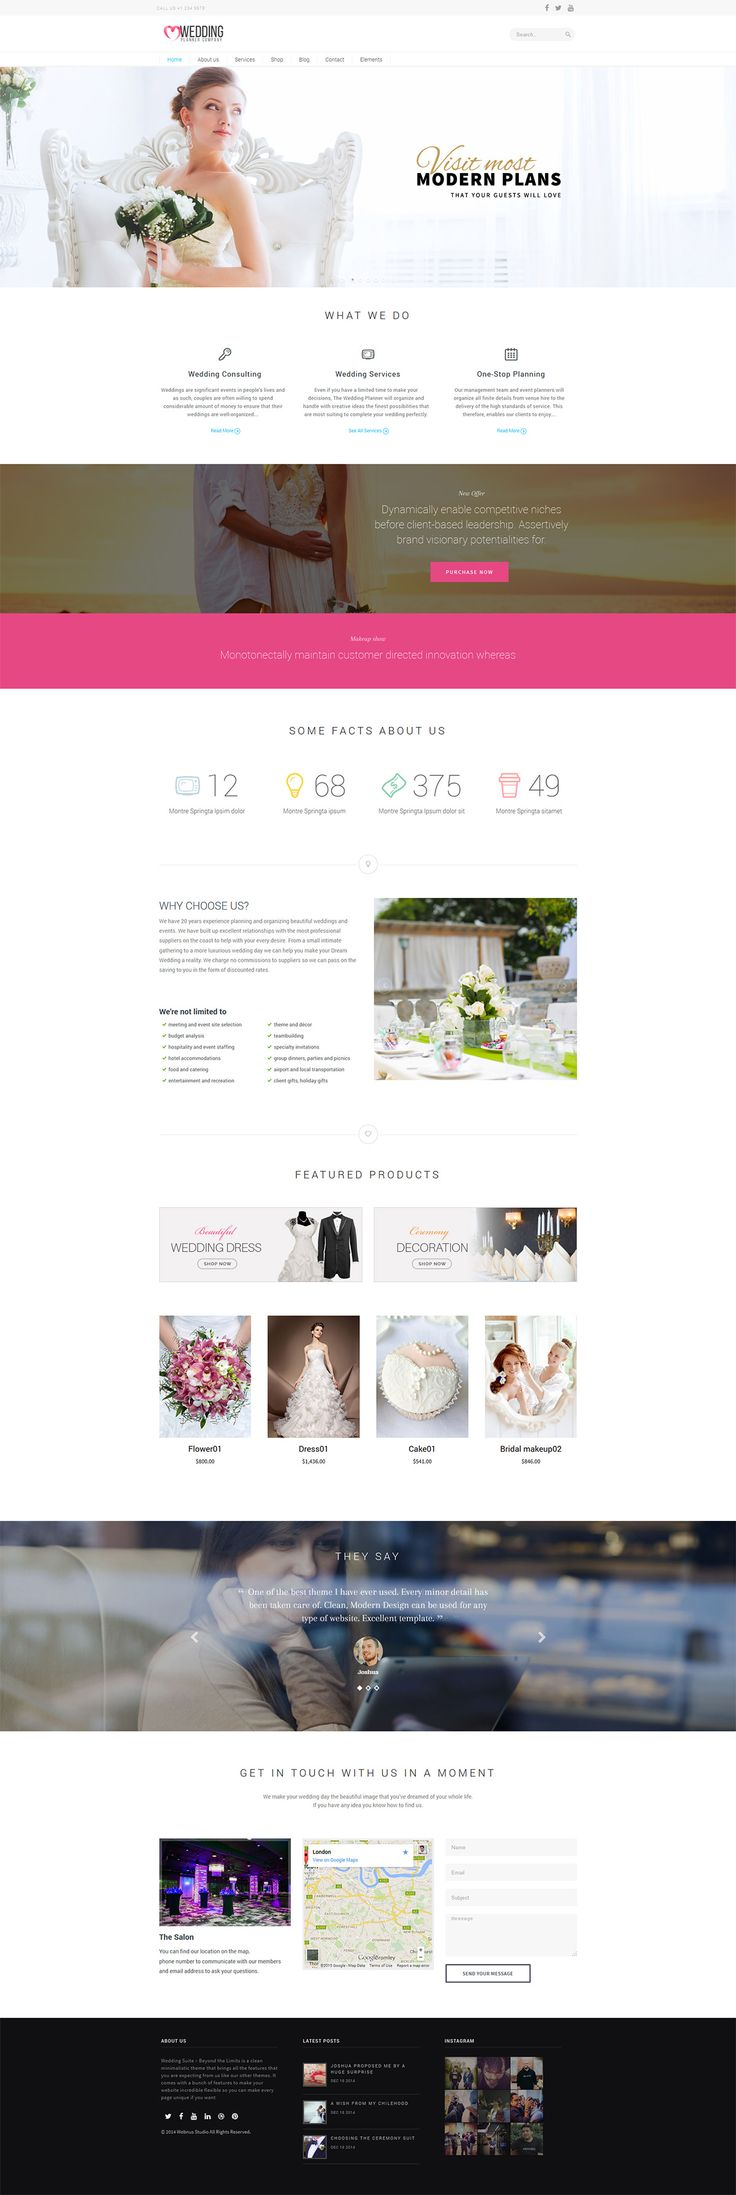 Wedding Suite - WordPress Wedding Theme #wedding #website #web #webdesign [www.pinterest.com/loganless/]